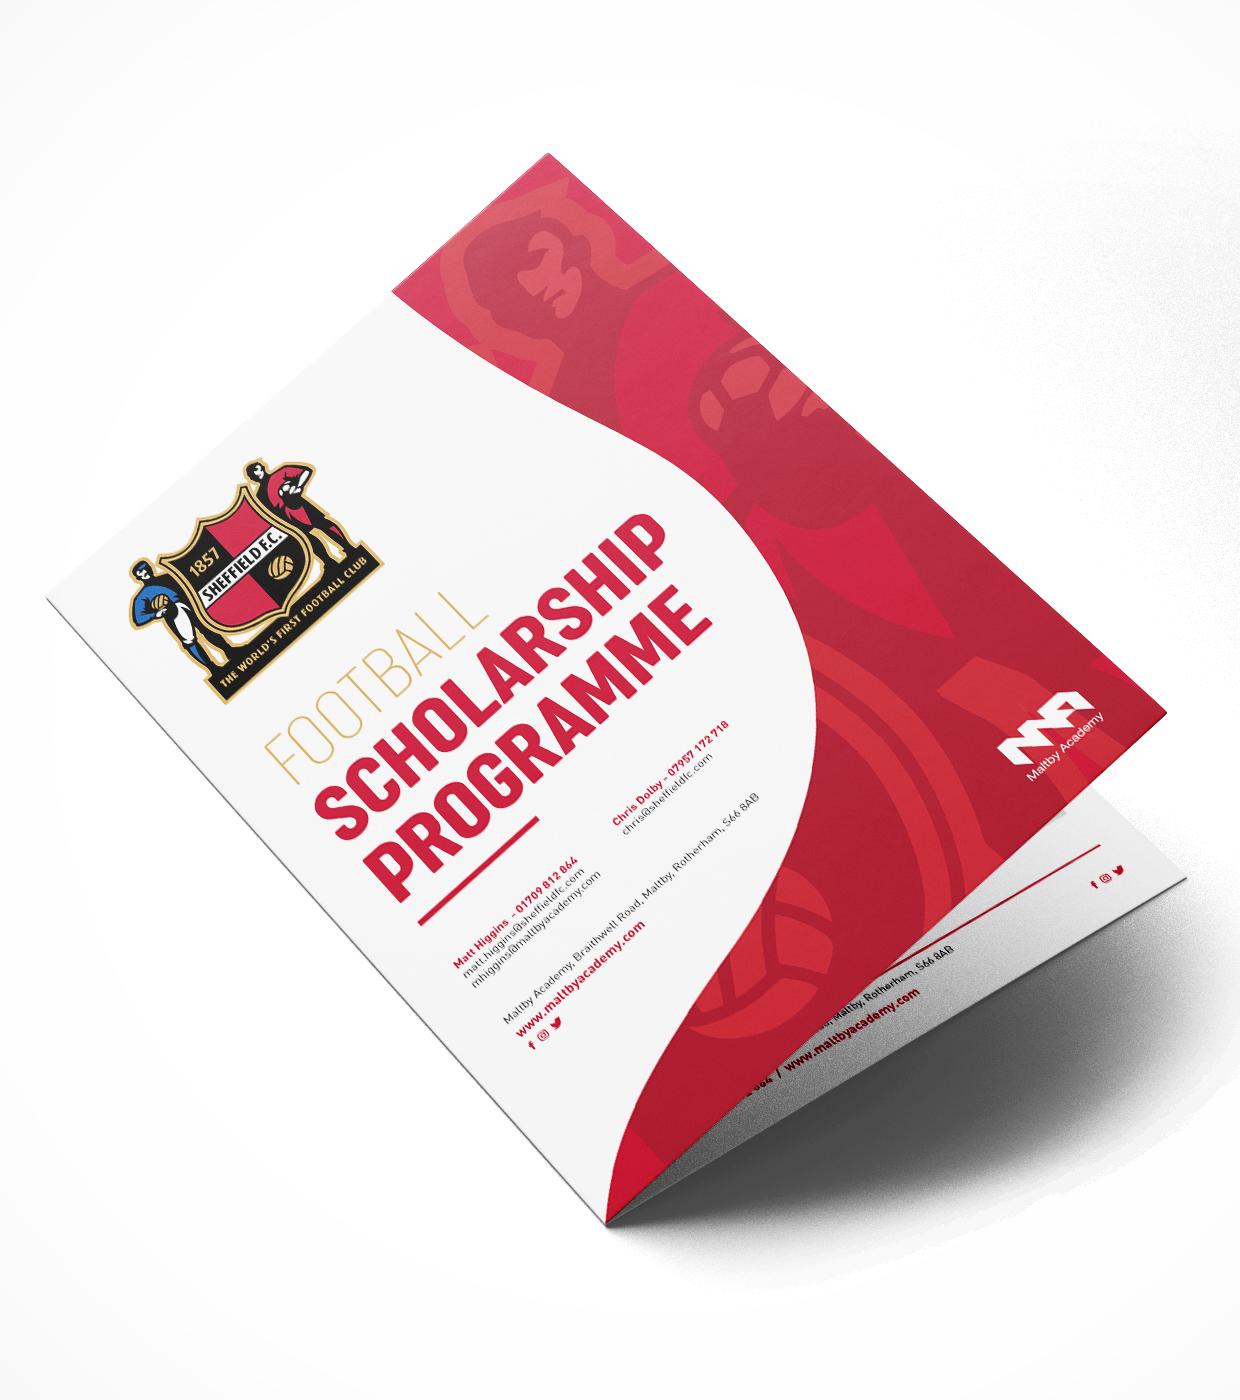 Idea Creative Design Studio Graphic Design Digital Design Website Design Photography Video Production South Yorkshire Manchester Maltby Academy Brochure Design